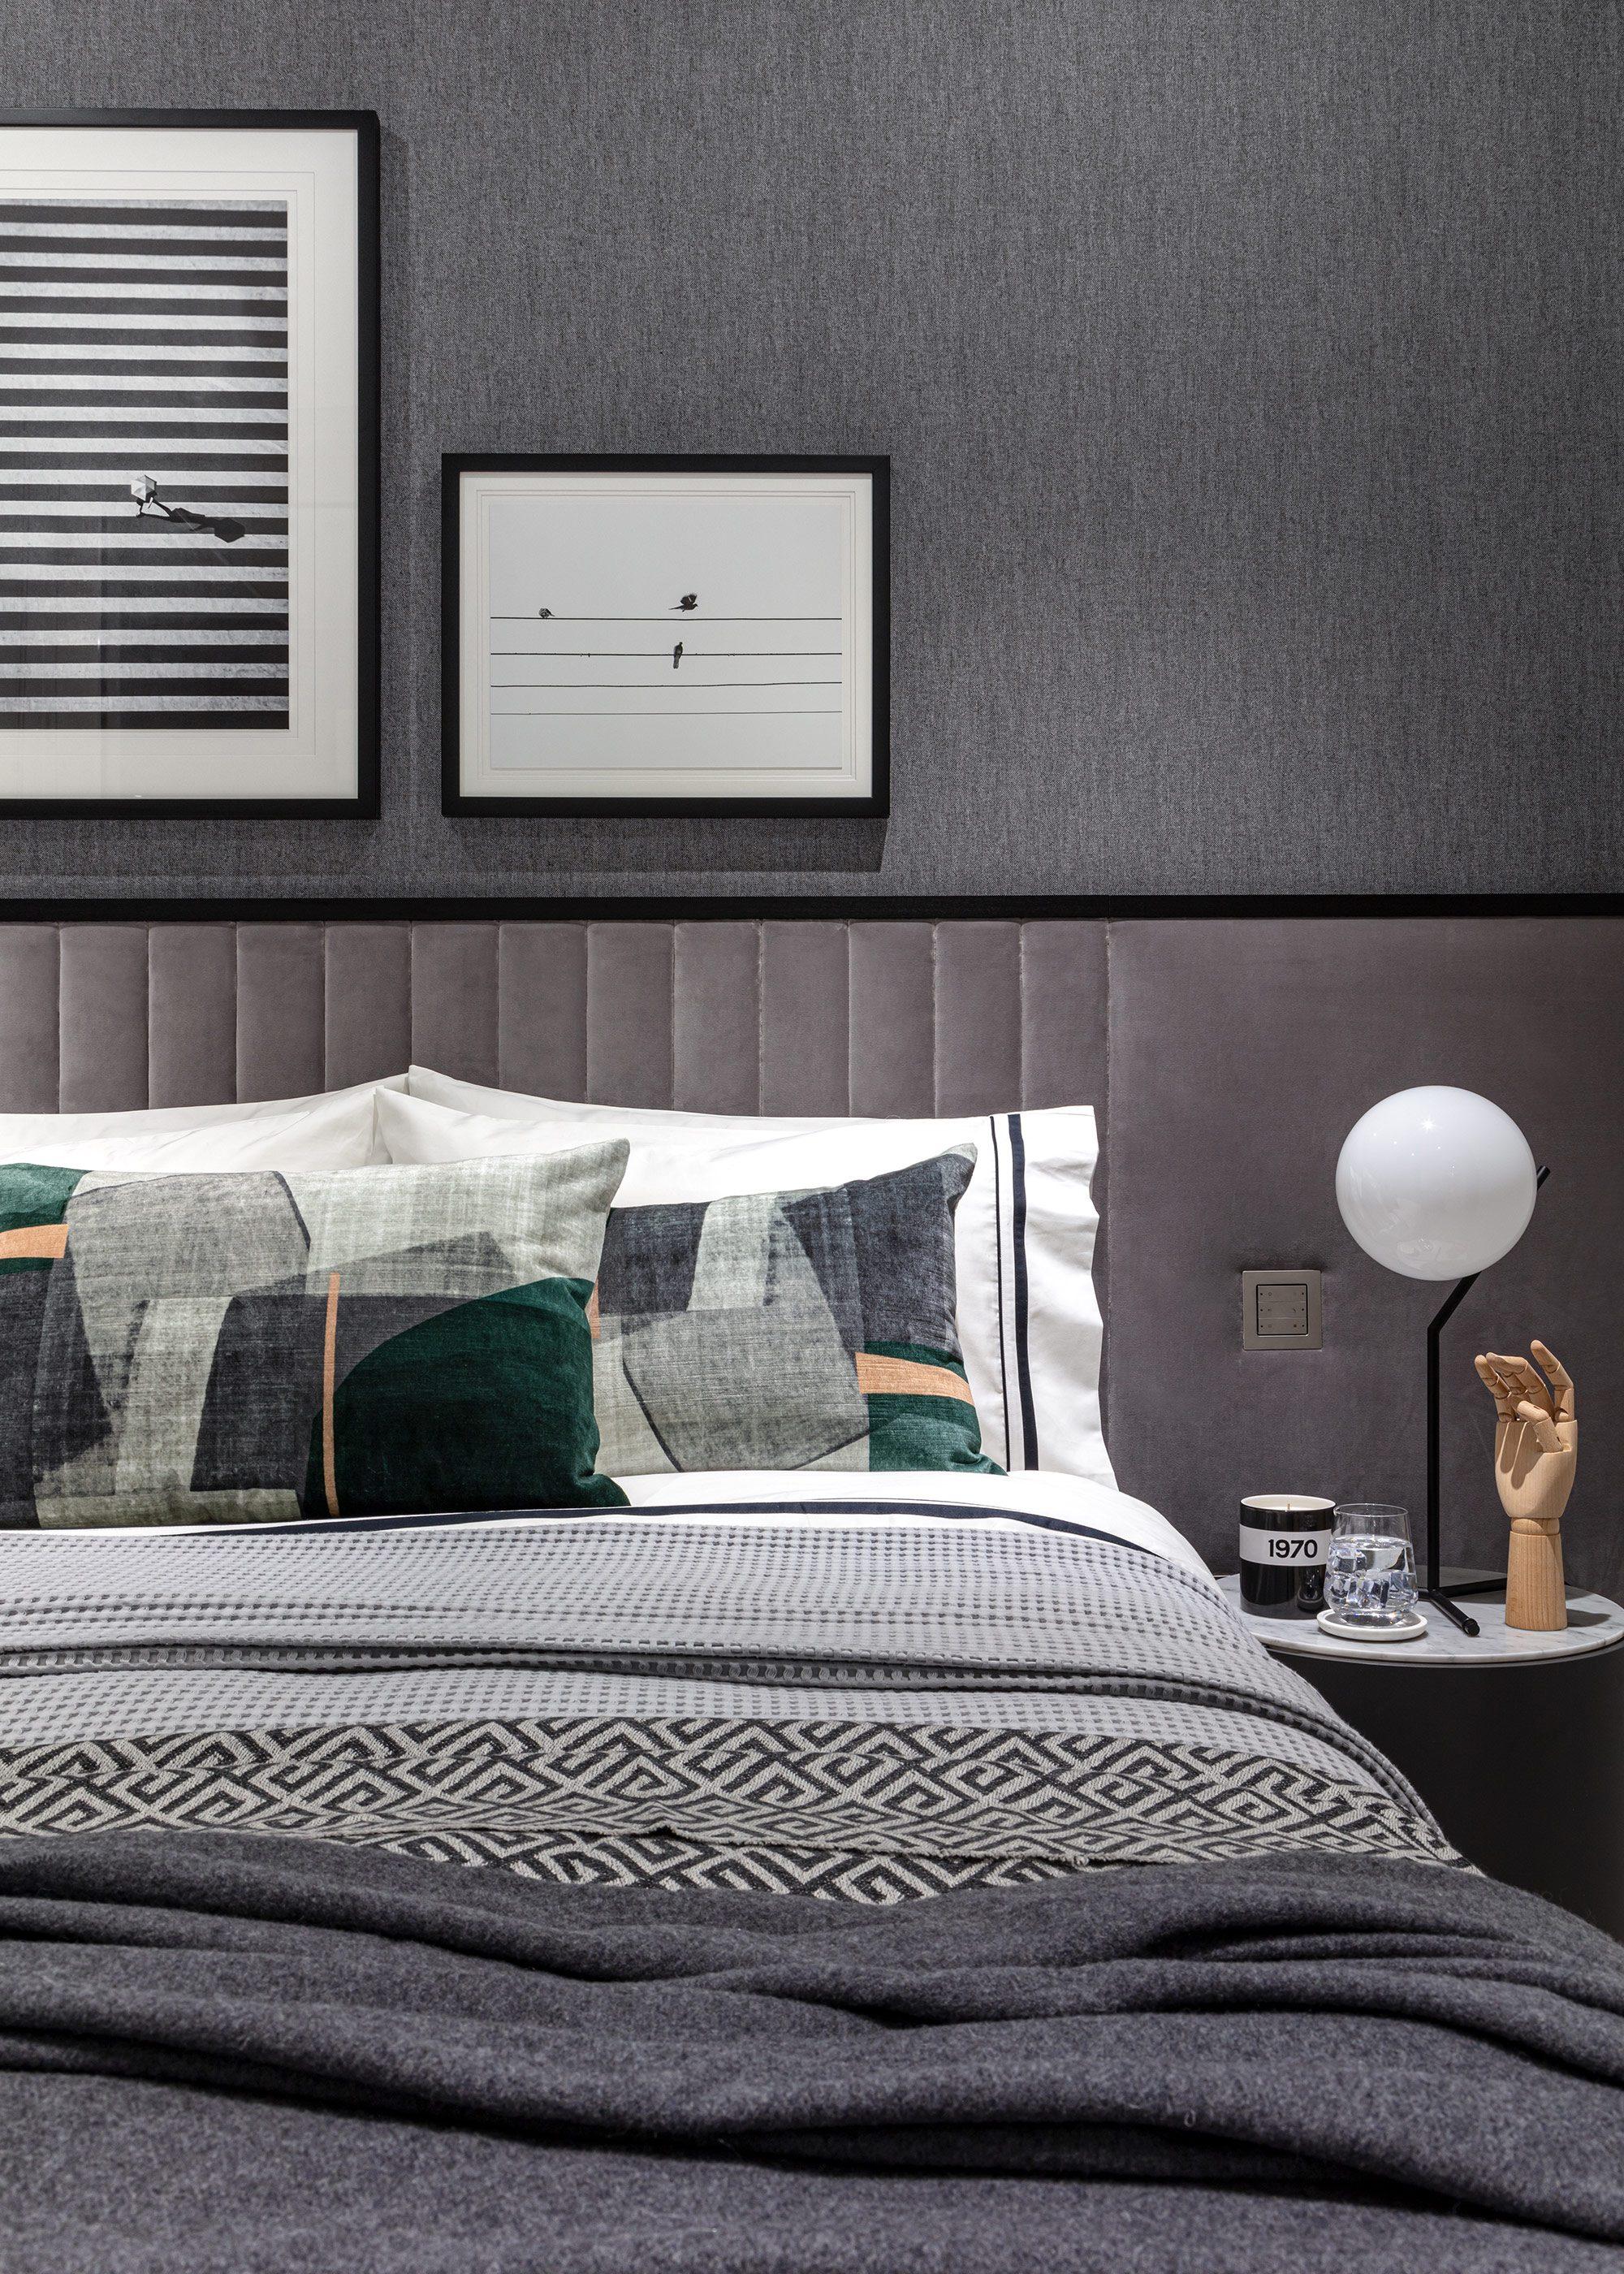 Honky Interior Design Luxury Apartment Hackney Road Bedroom Detail 1a